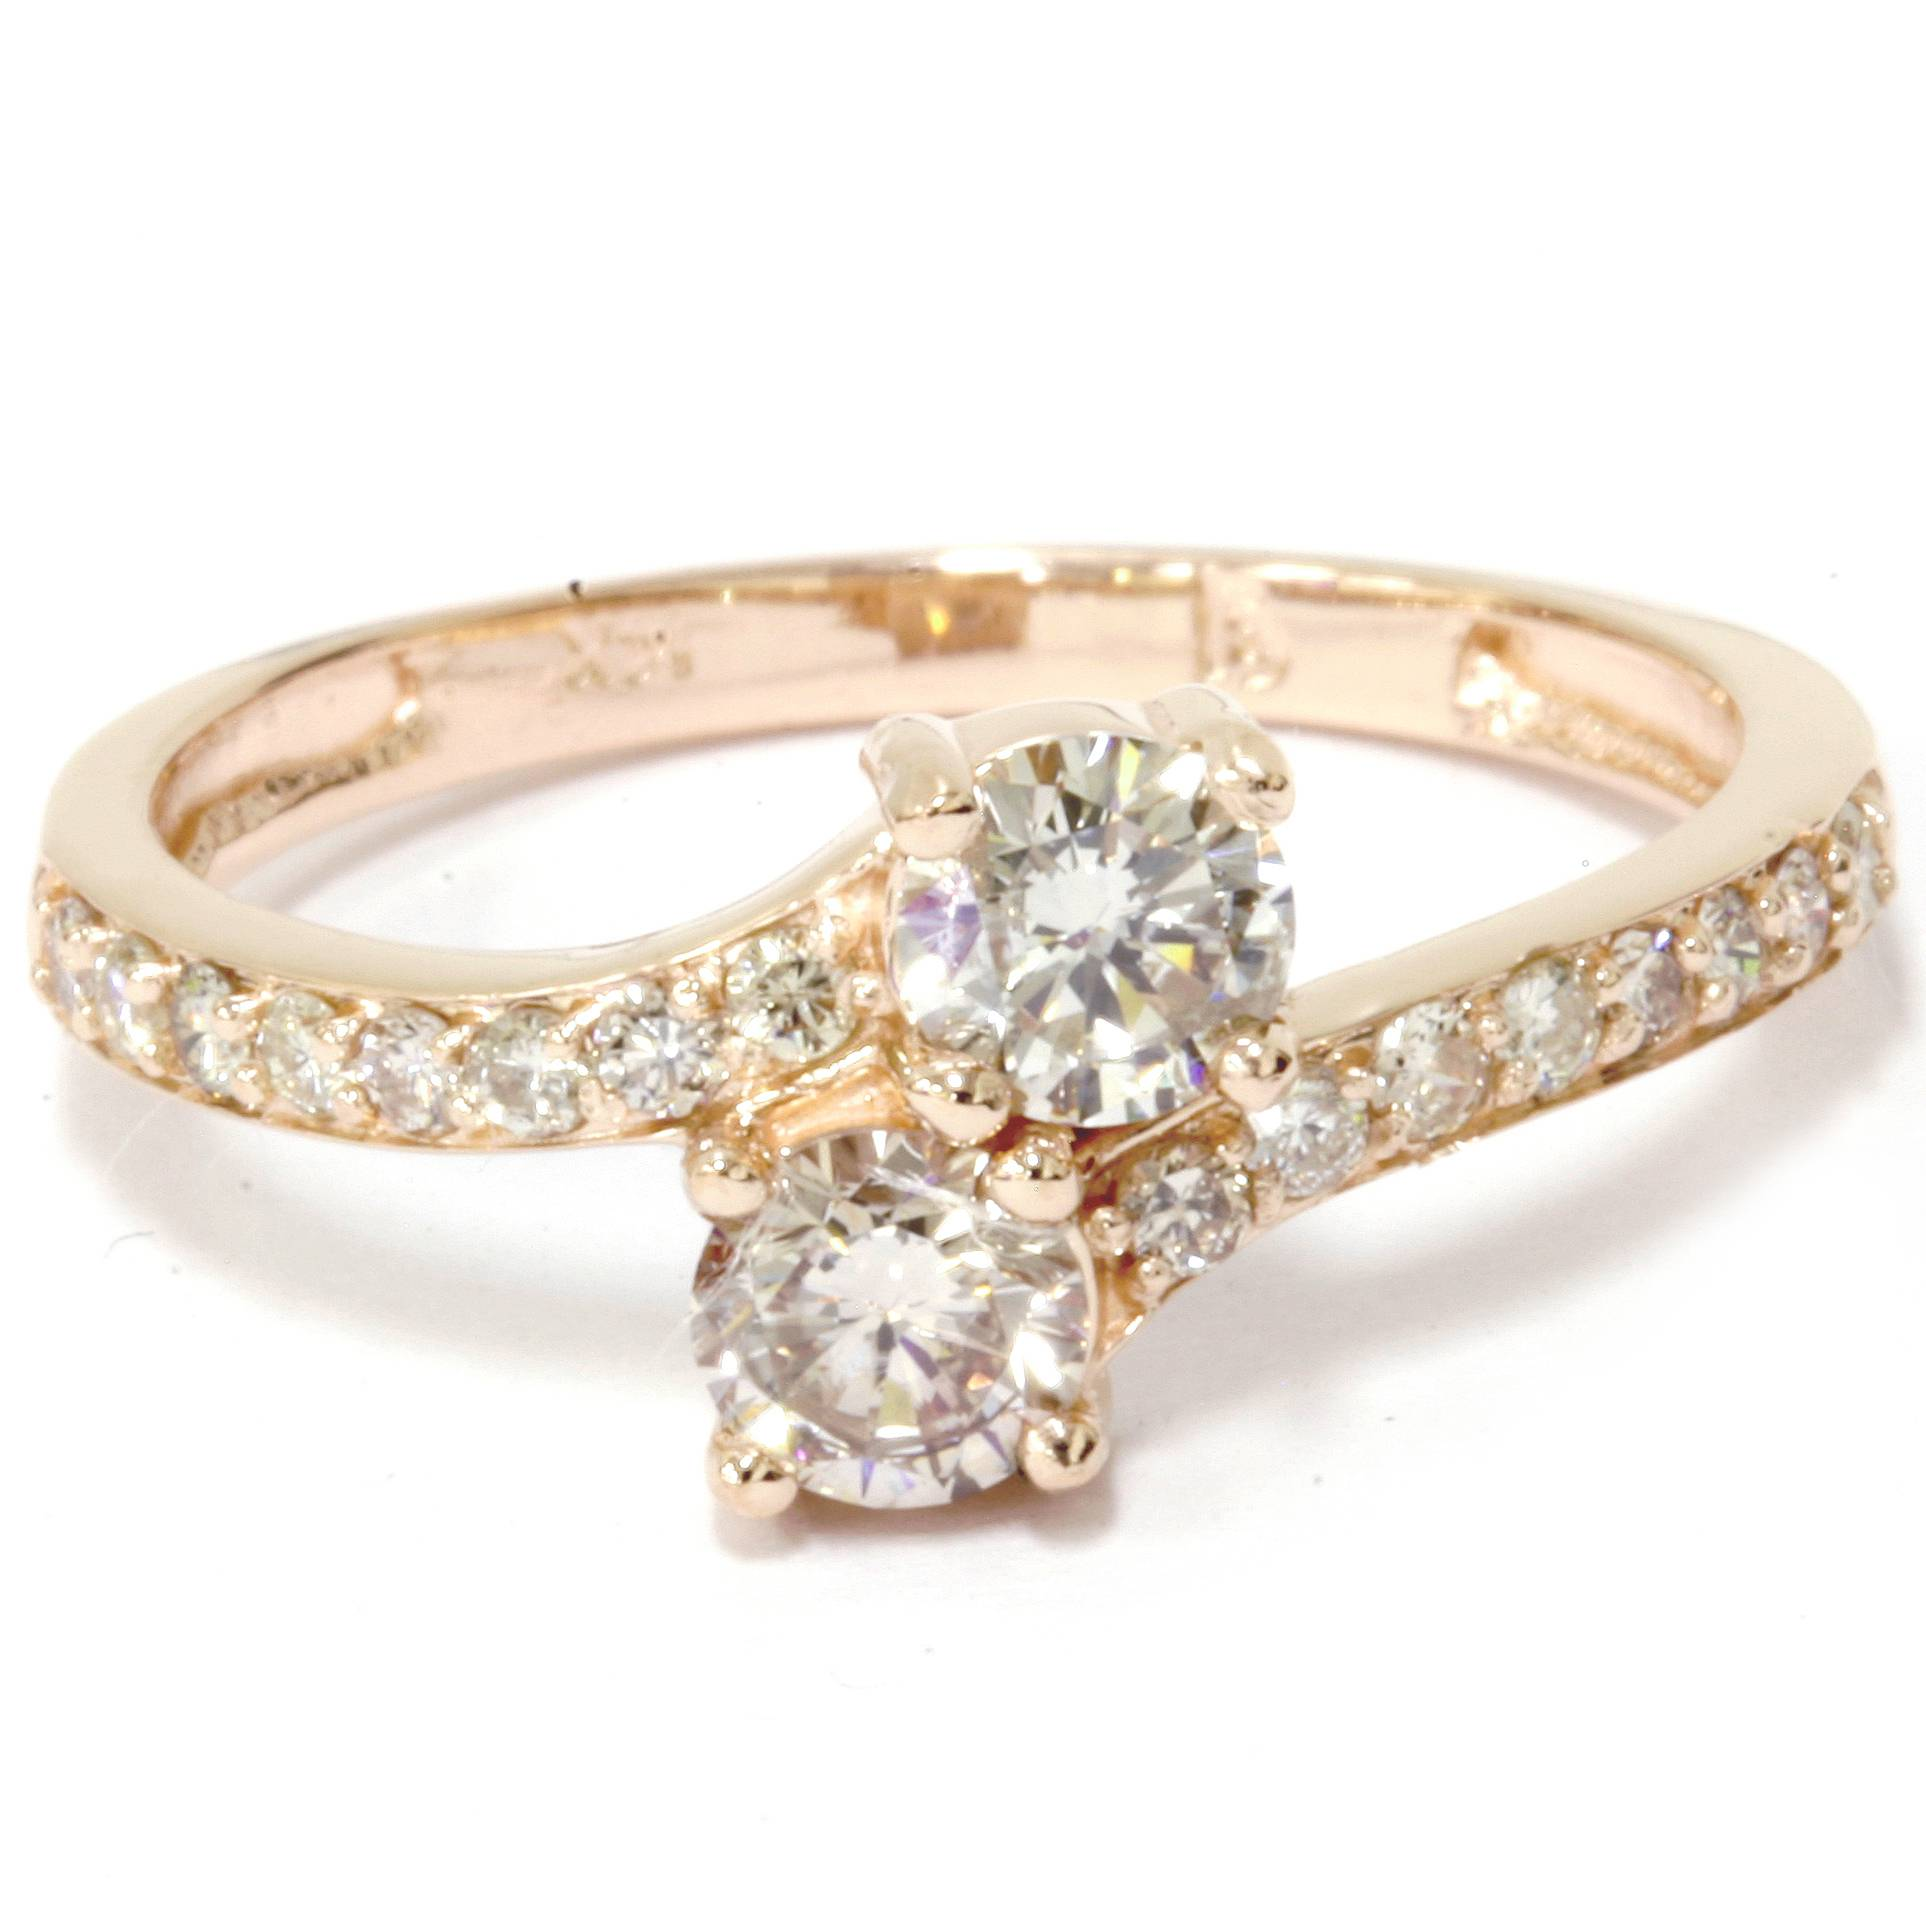 1 carat forever us 2 stone diamond ring 10k yellow gold ebay. Black Bedroom Furniture Sets. Home Design Ideas